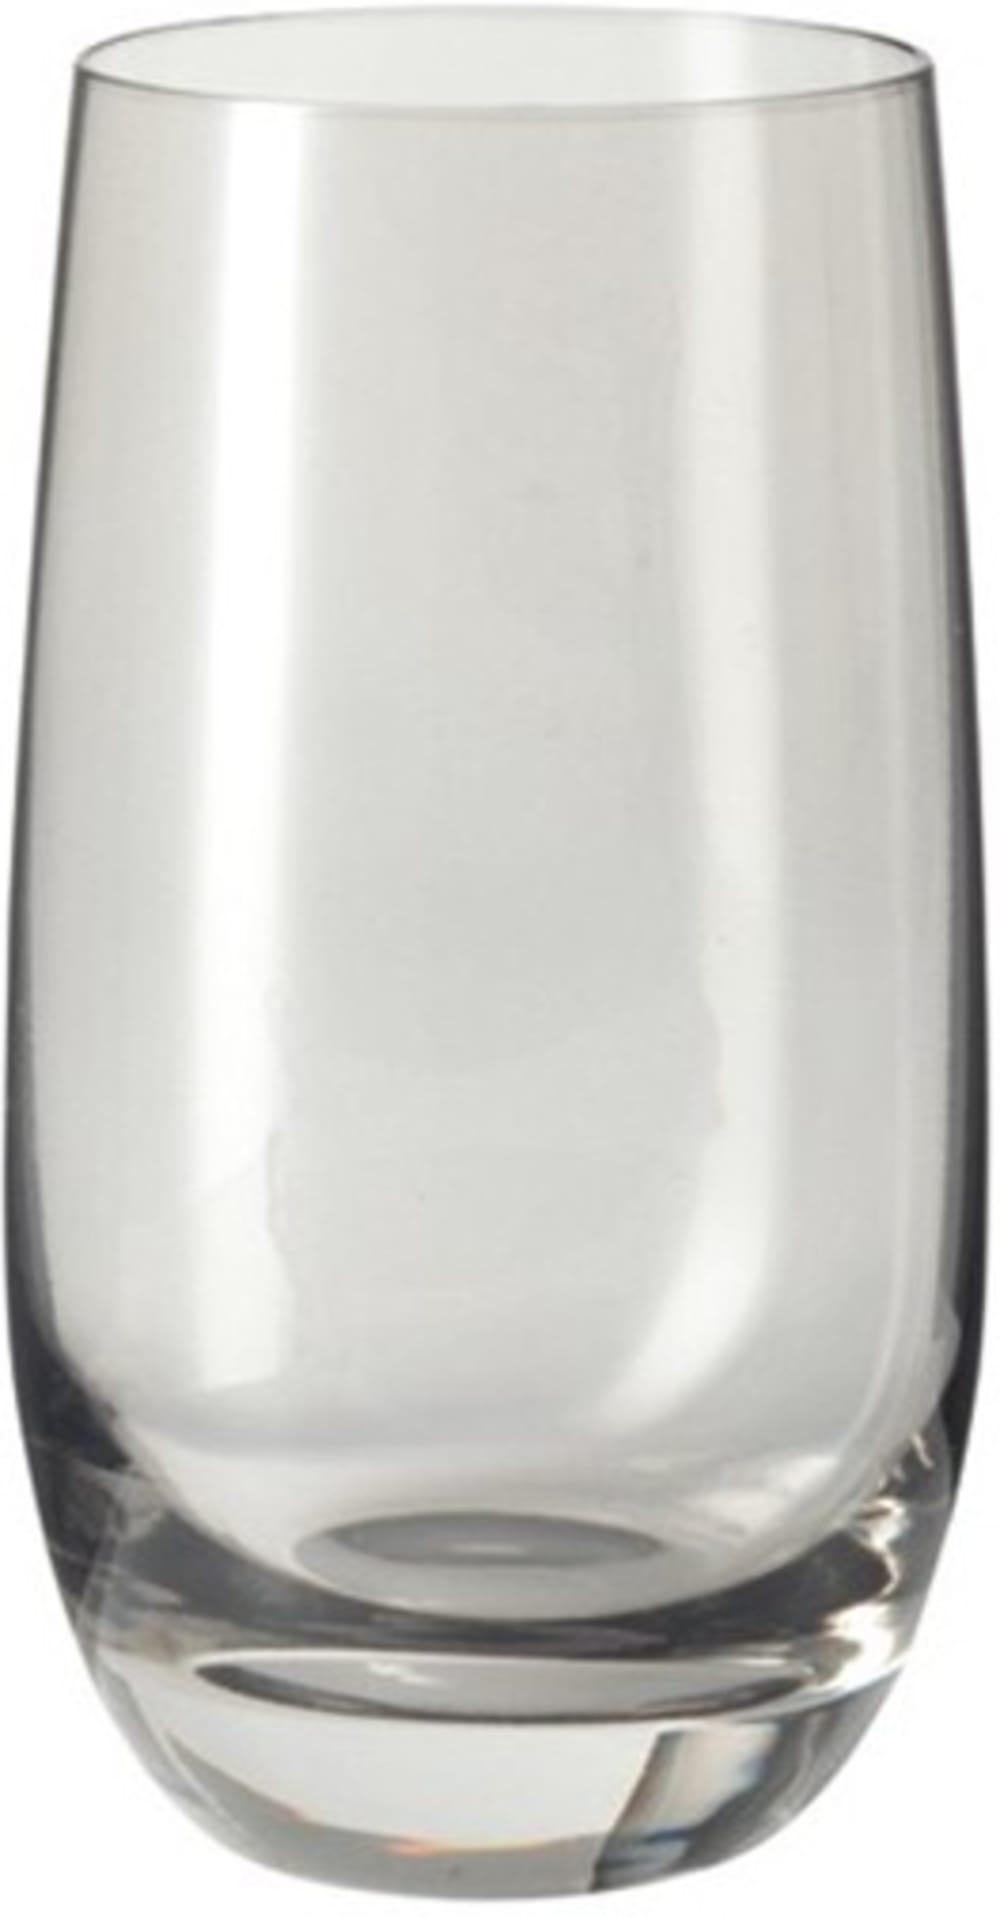 LO - Szklanka 390 ml, szara, COLORI